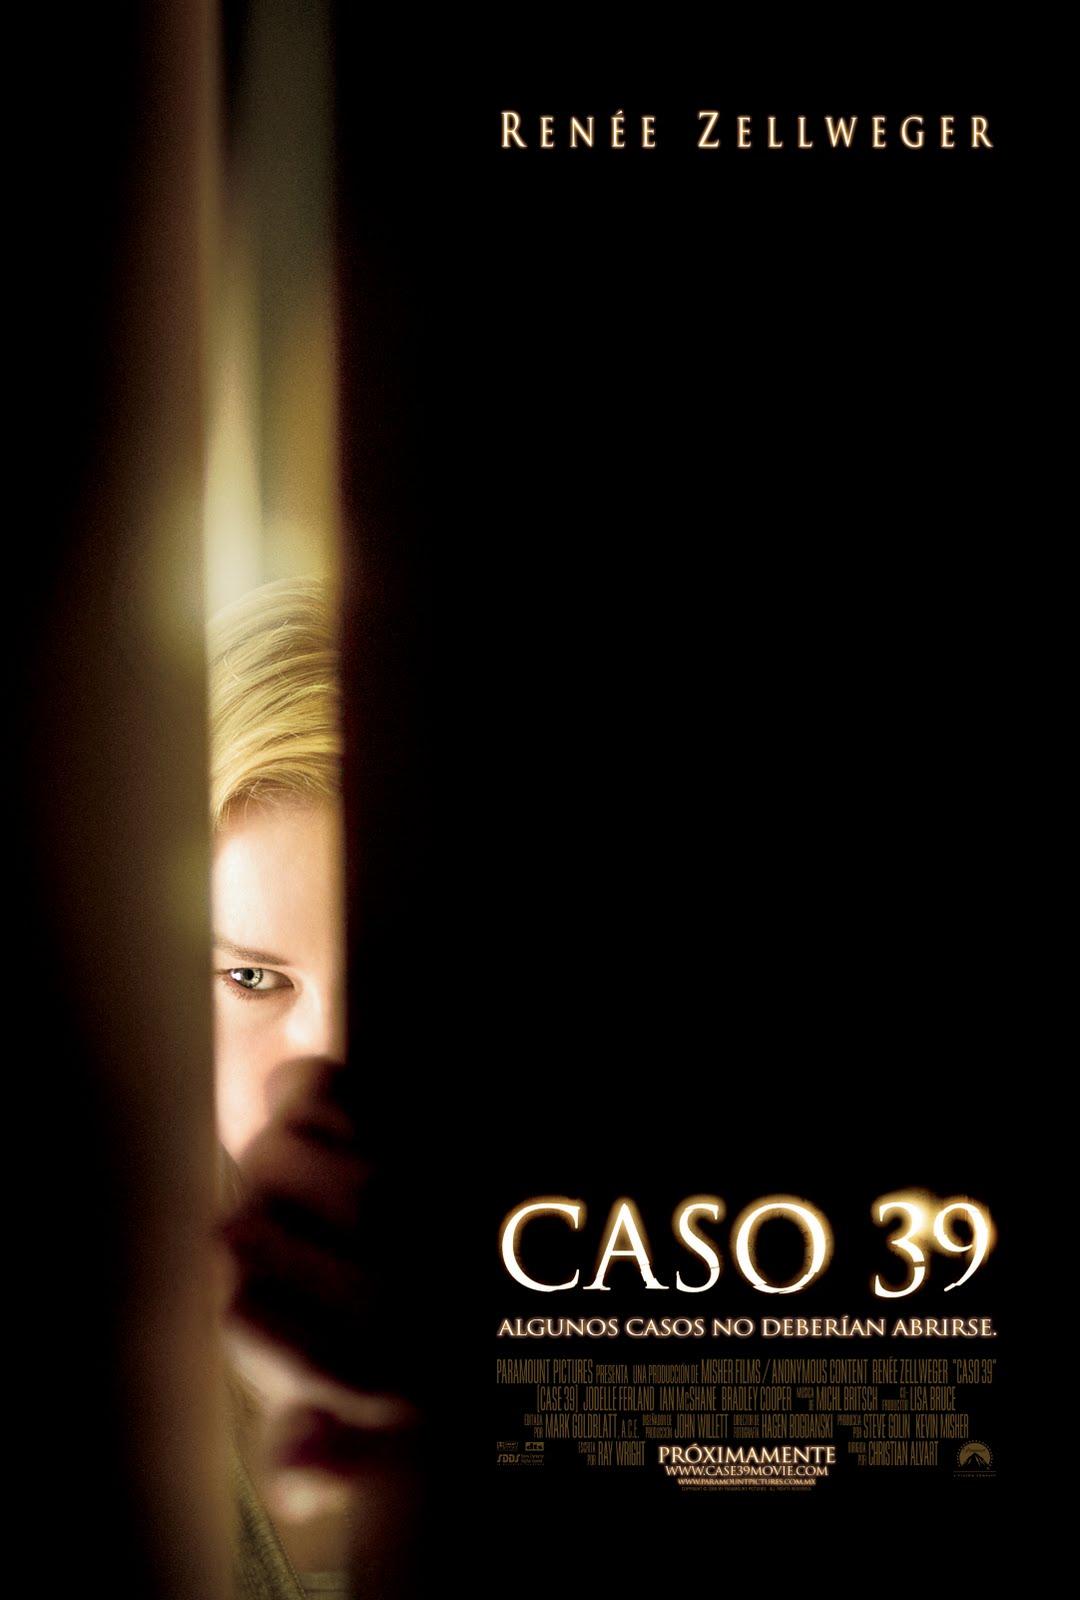 http://3.bp.blogspot.com/_FSvhnyv7xUE/TEQm5lYmBZI/AAAAAAAABts/hcgrhOekm_Y/s1600/caso-39-poster-lr.jpg